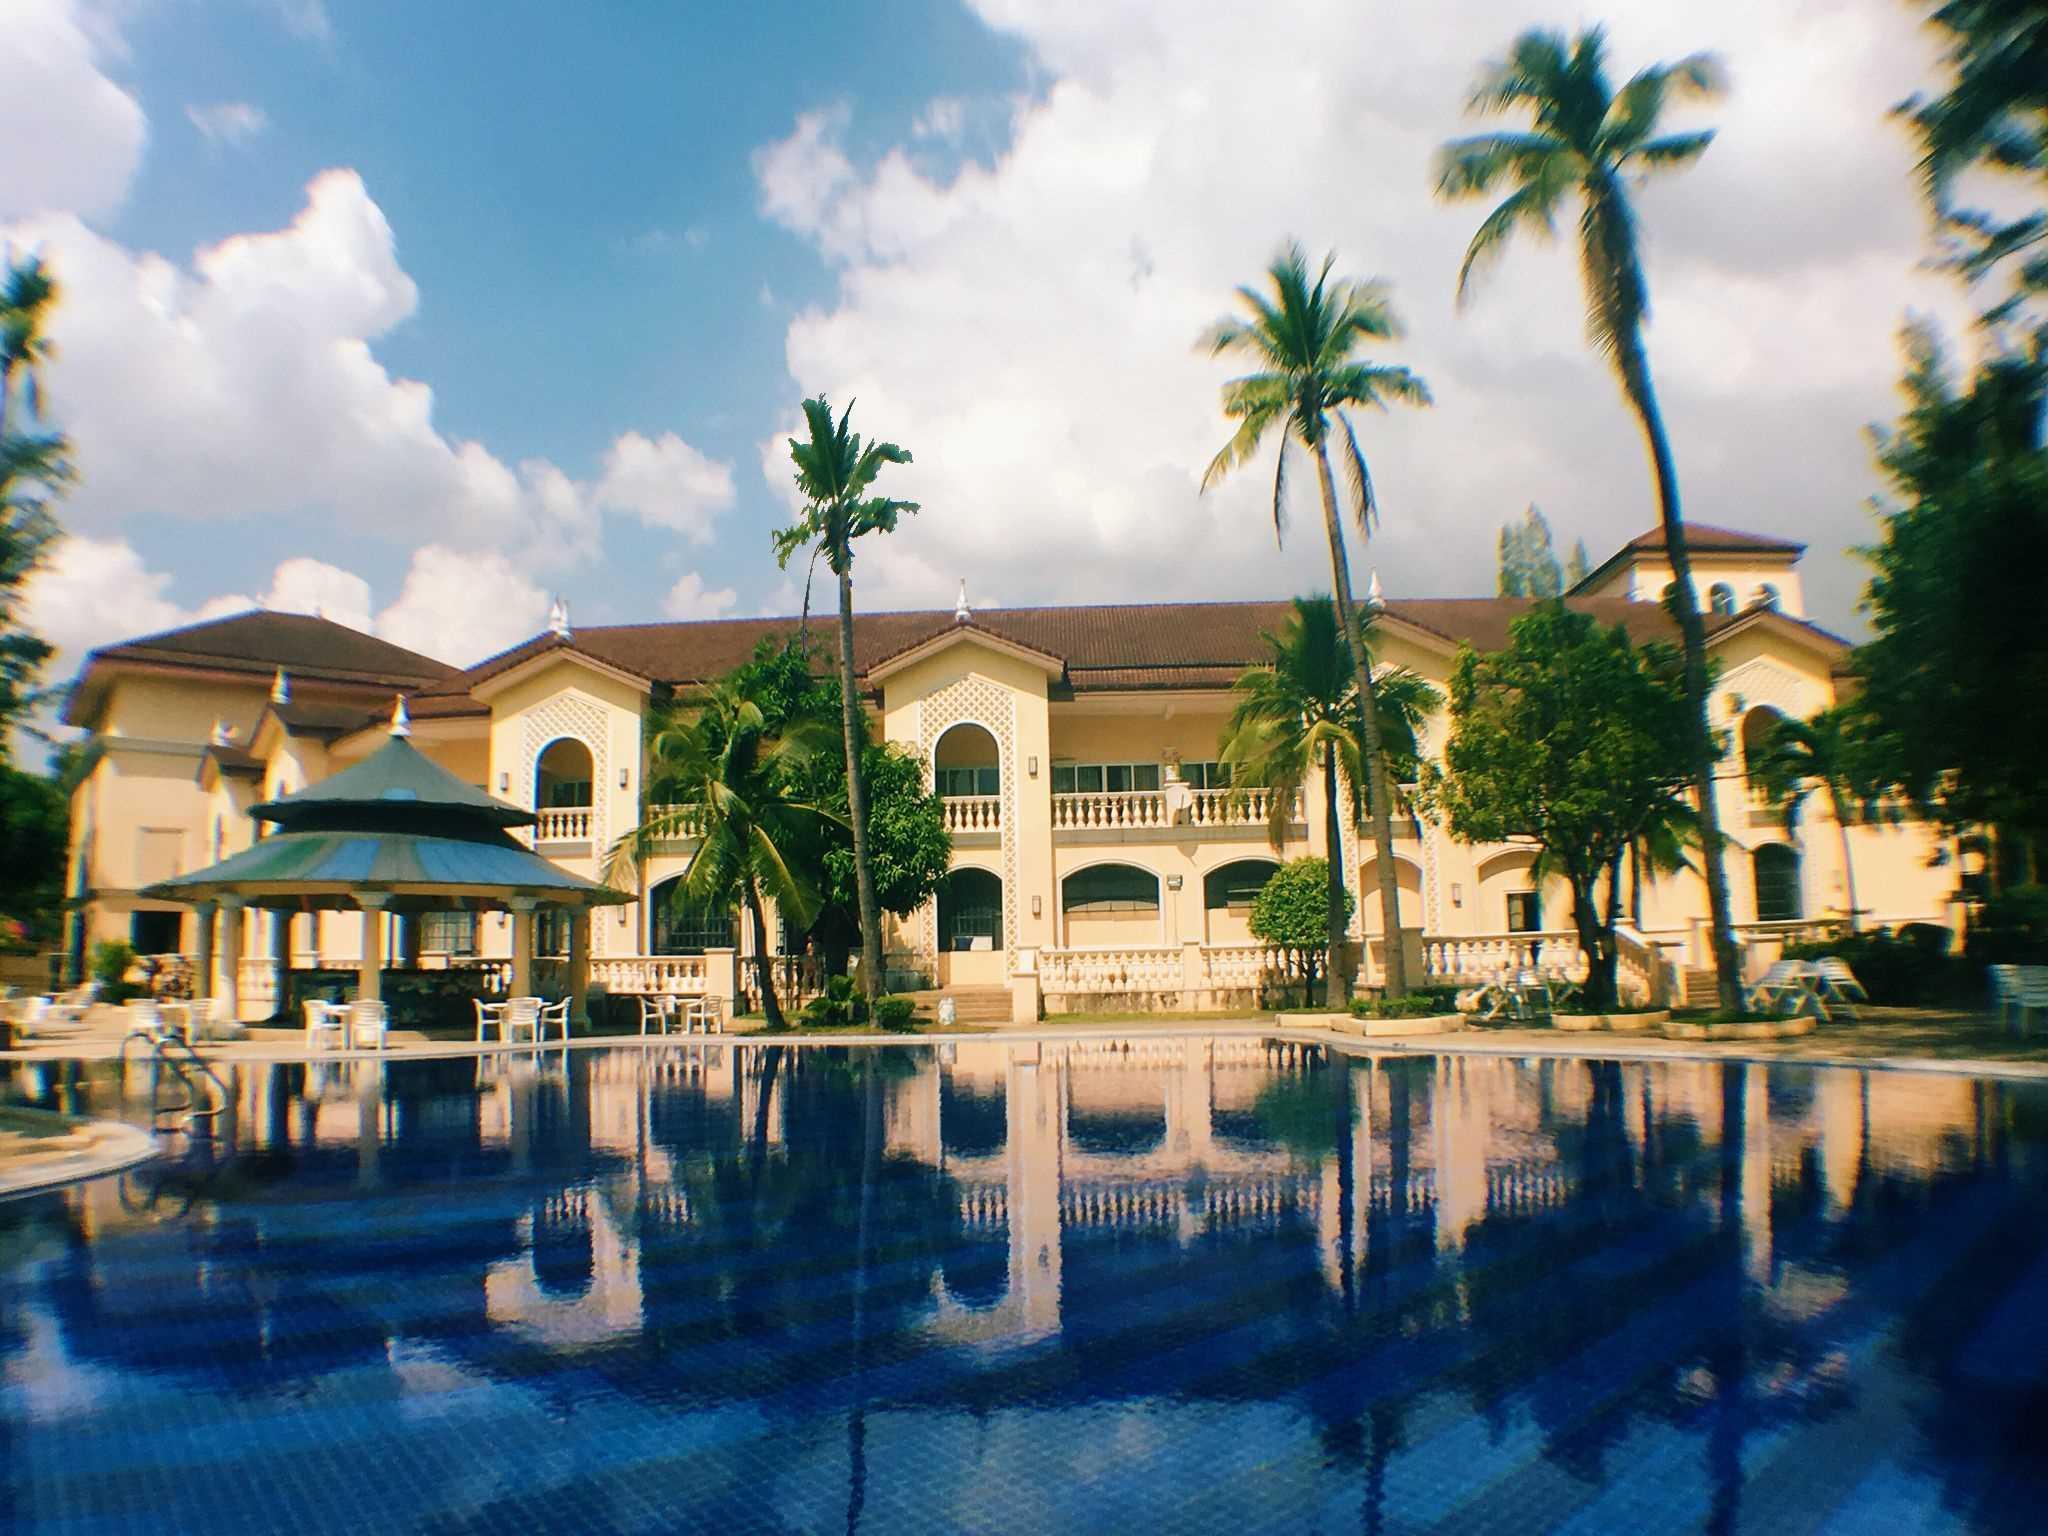 Club Morocco Beach Resort And Country Club Subic